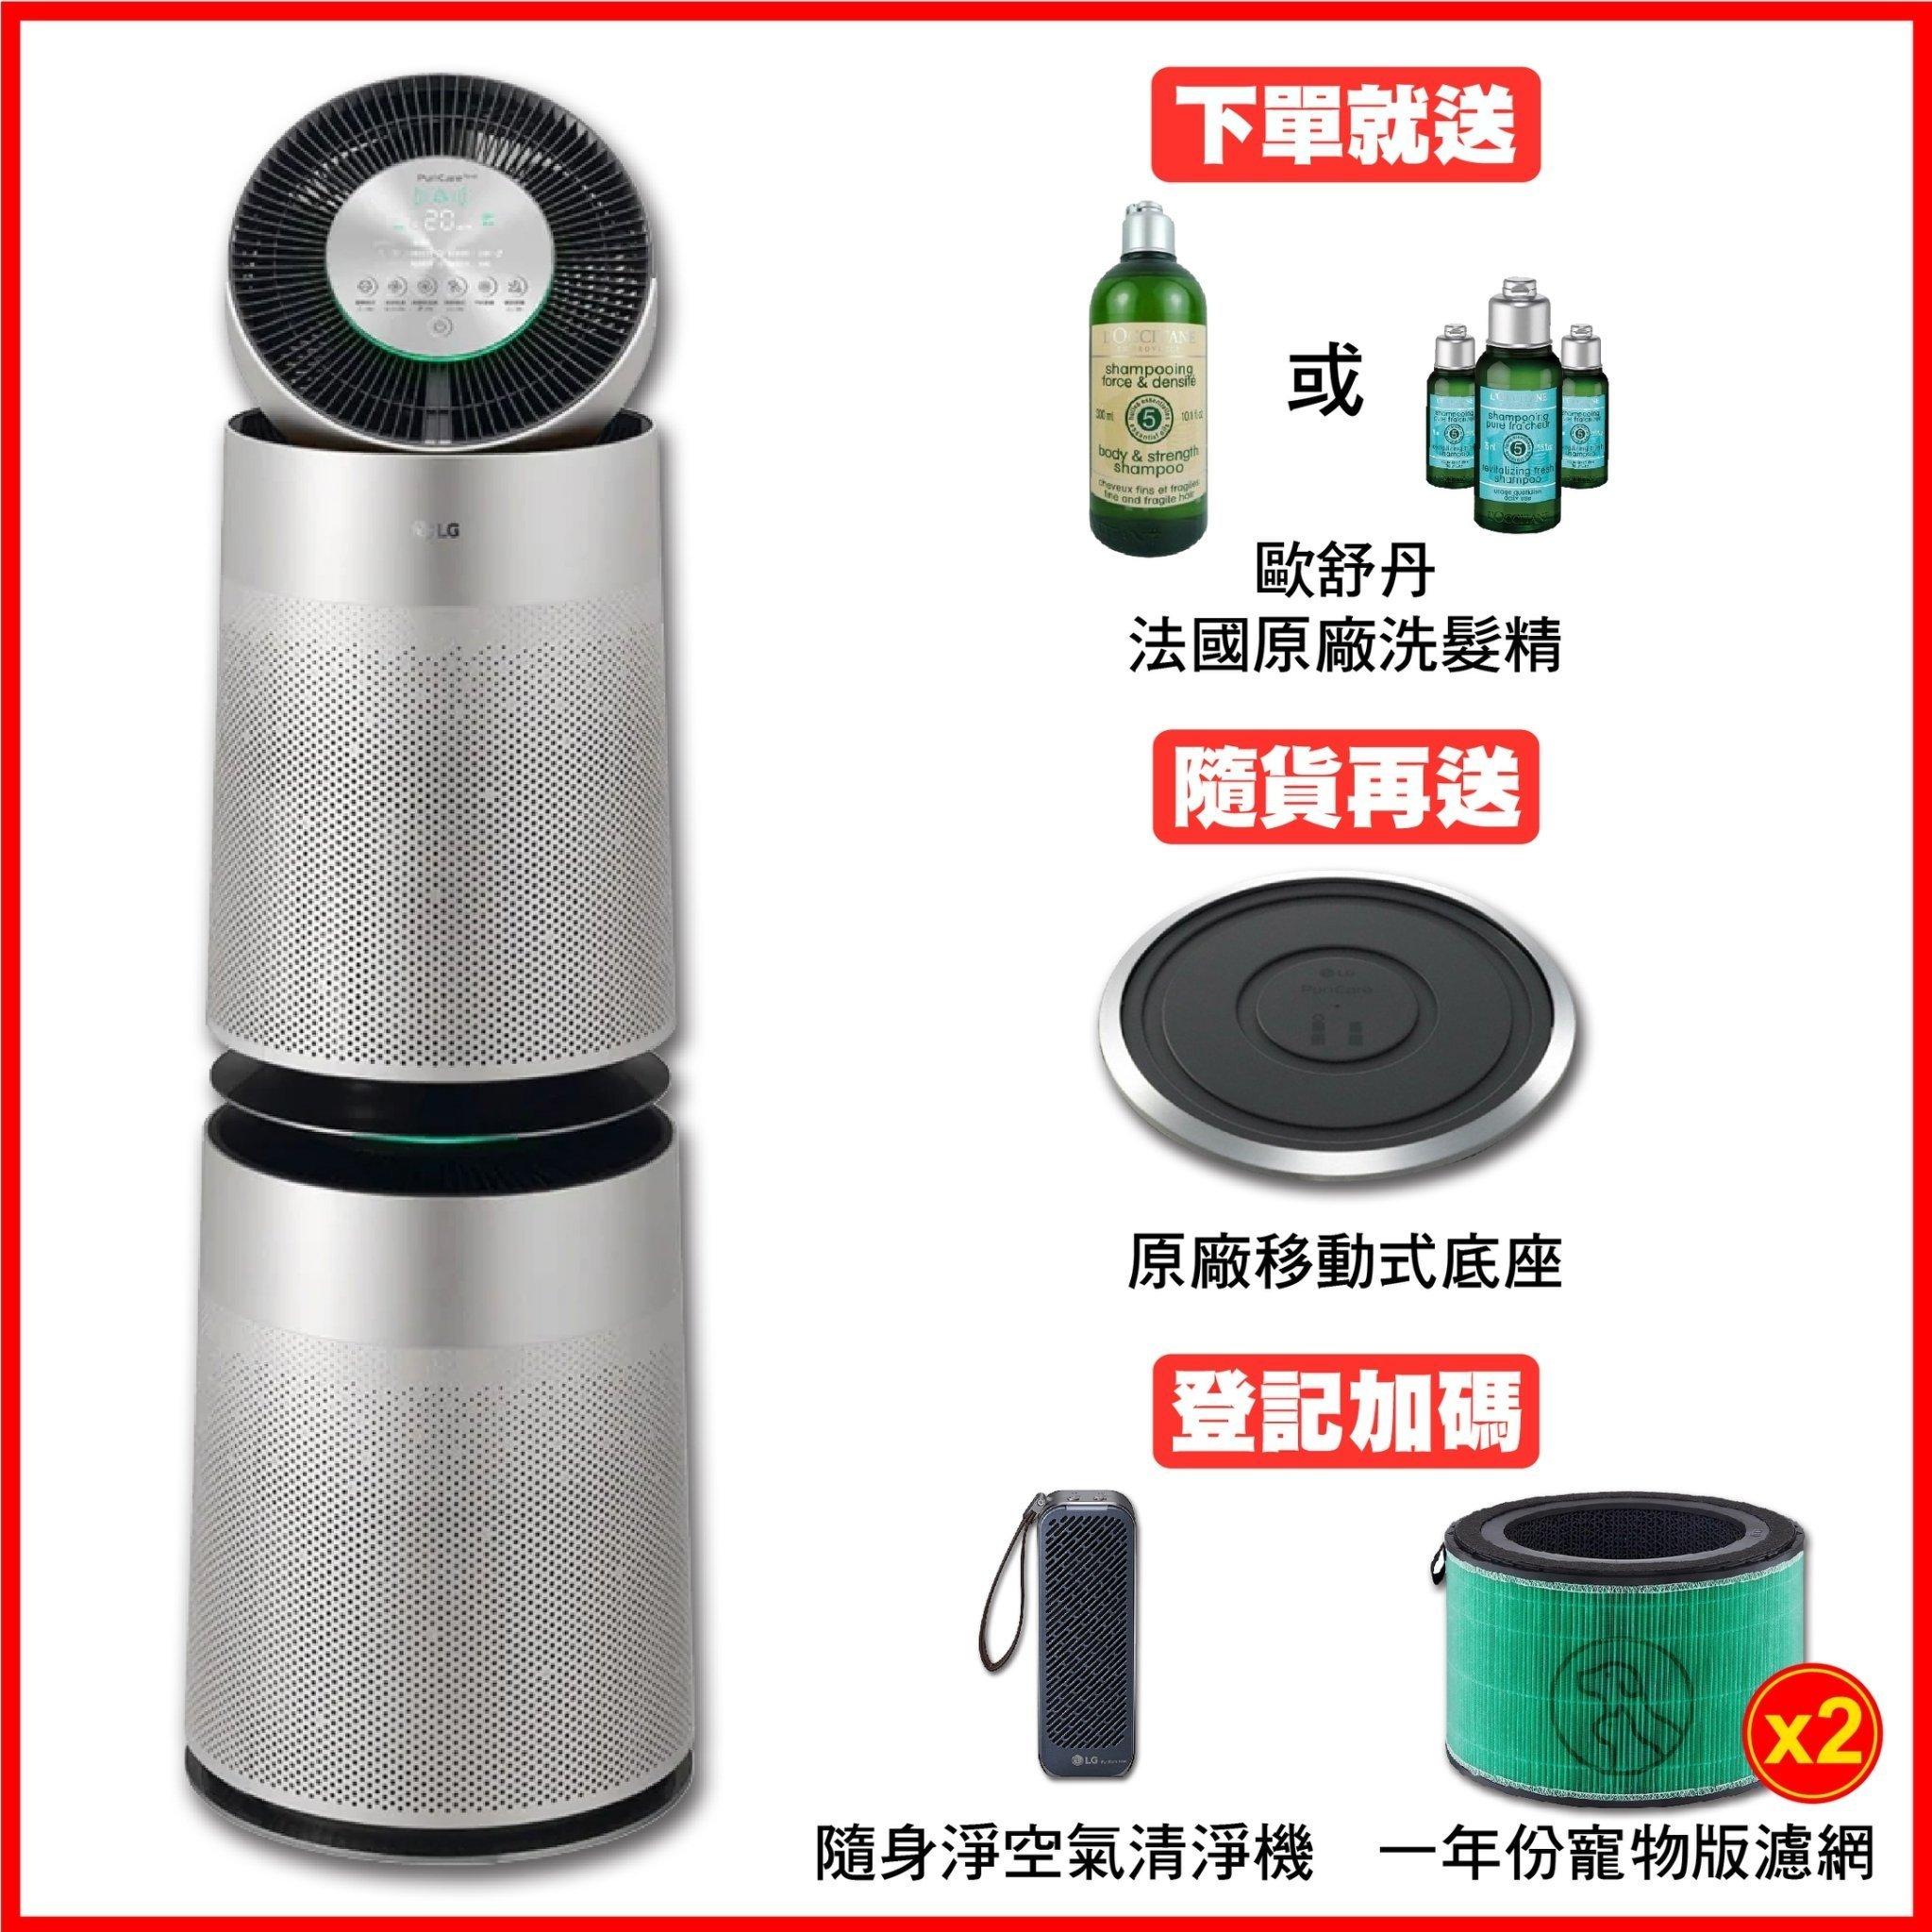 LG 樂金 PuriCare™360°空氣清淨機 2.0 AS101DSS0 原廠保固 夜間促銷超低價 黑皮TIME